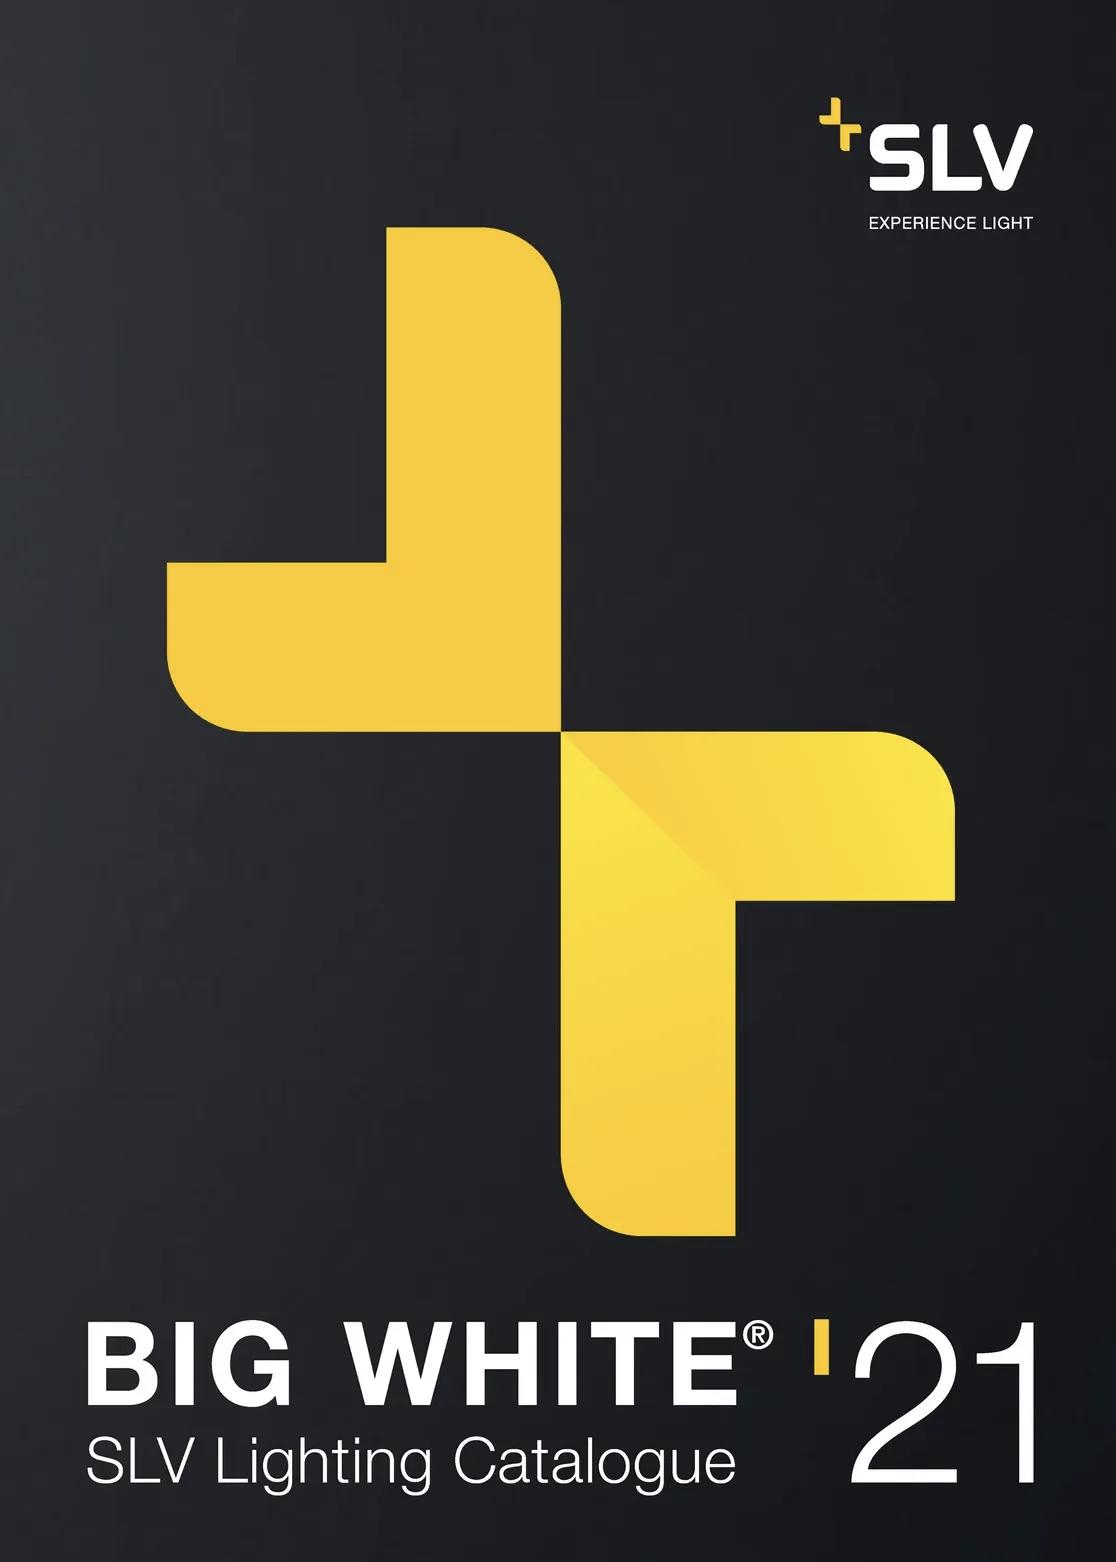 SLV BIG WHITE 2021